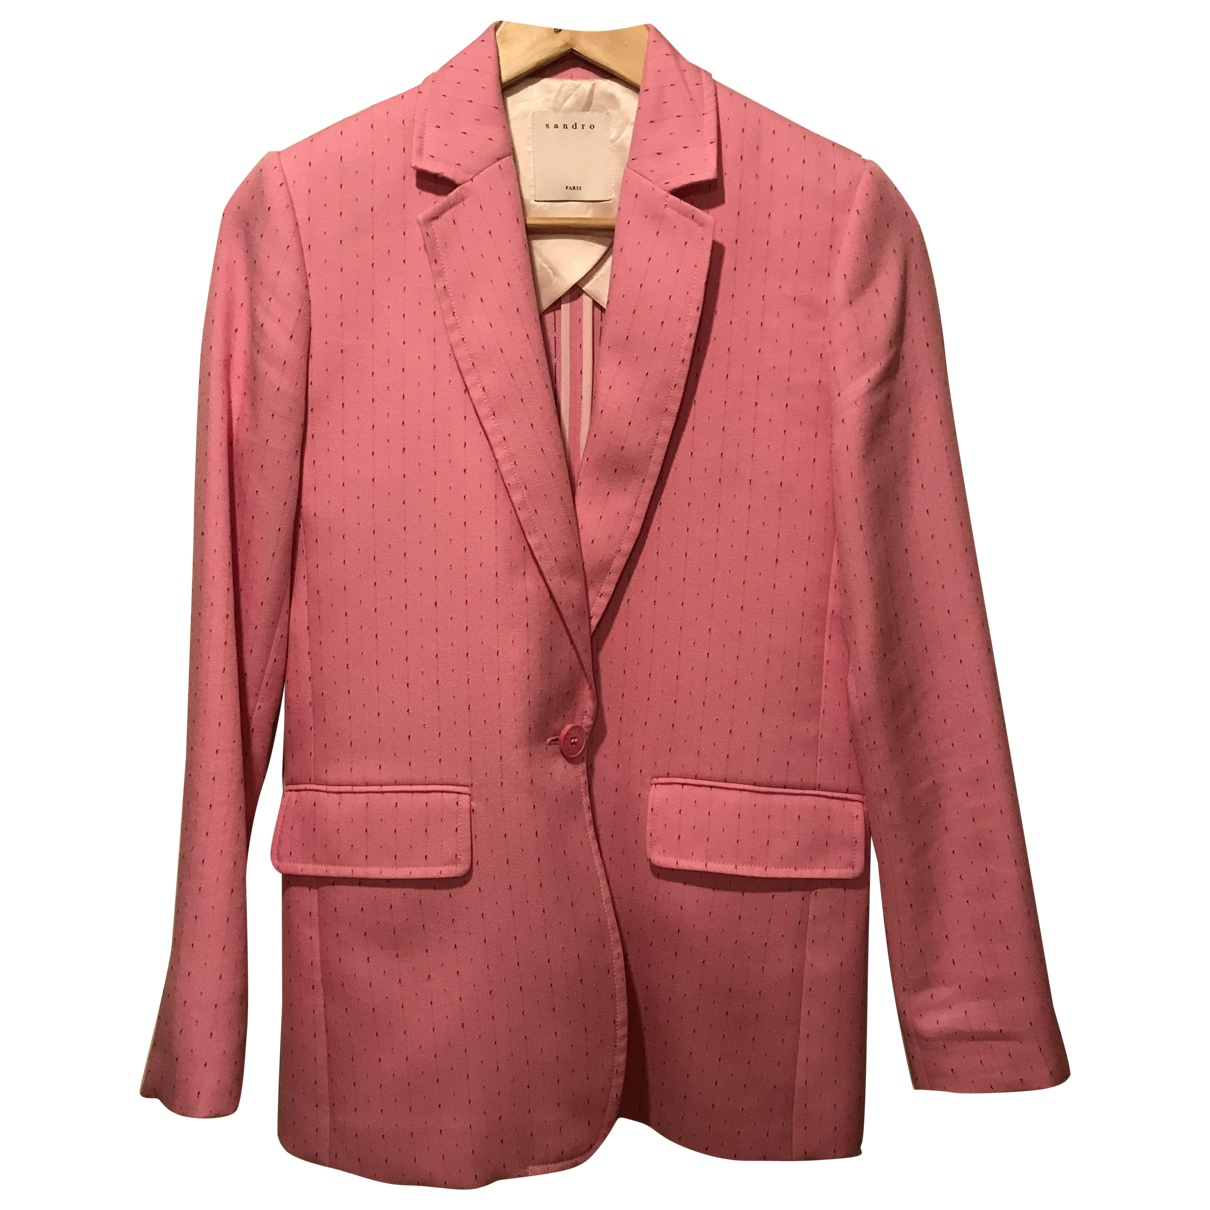 Sandro Spring Summer 2019 Pink Wool jacket for Women 36 FR